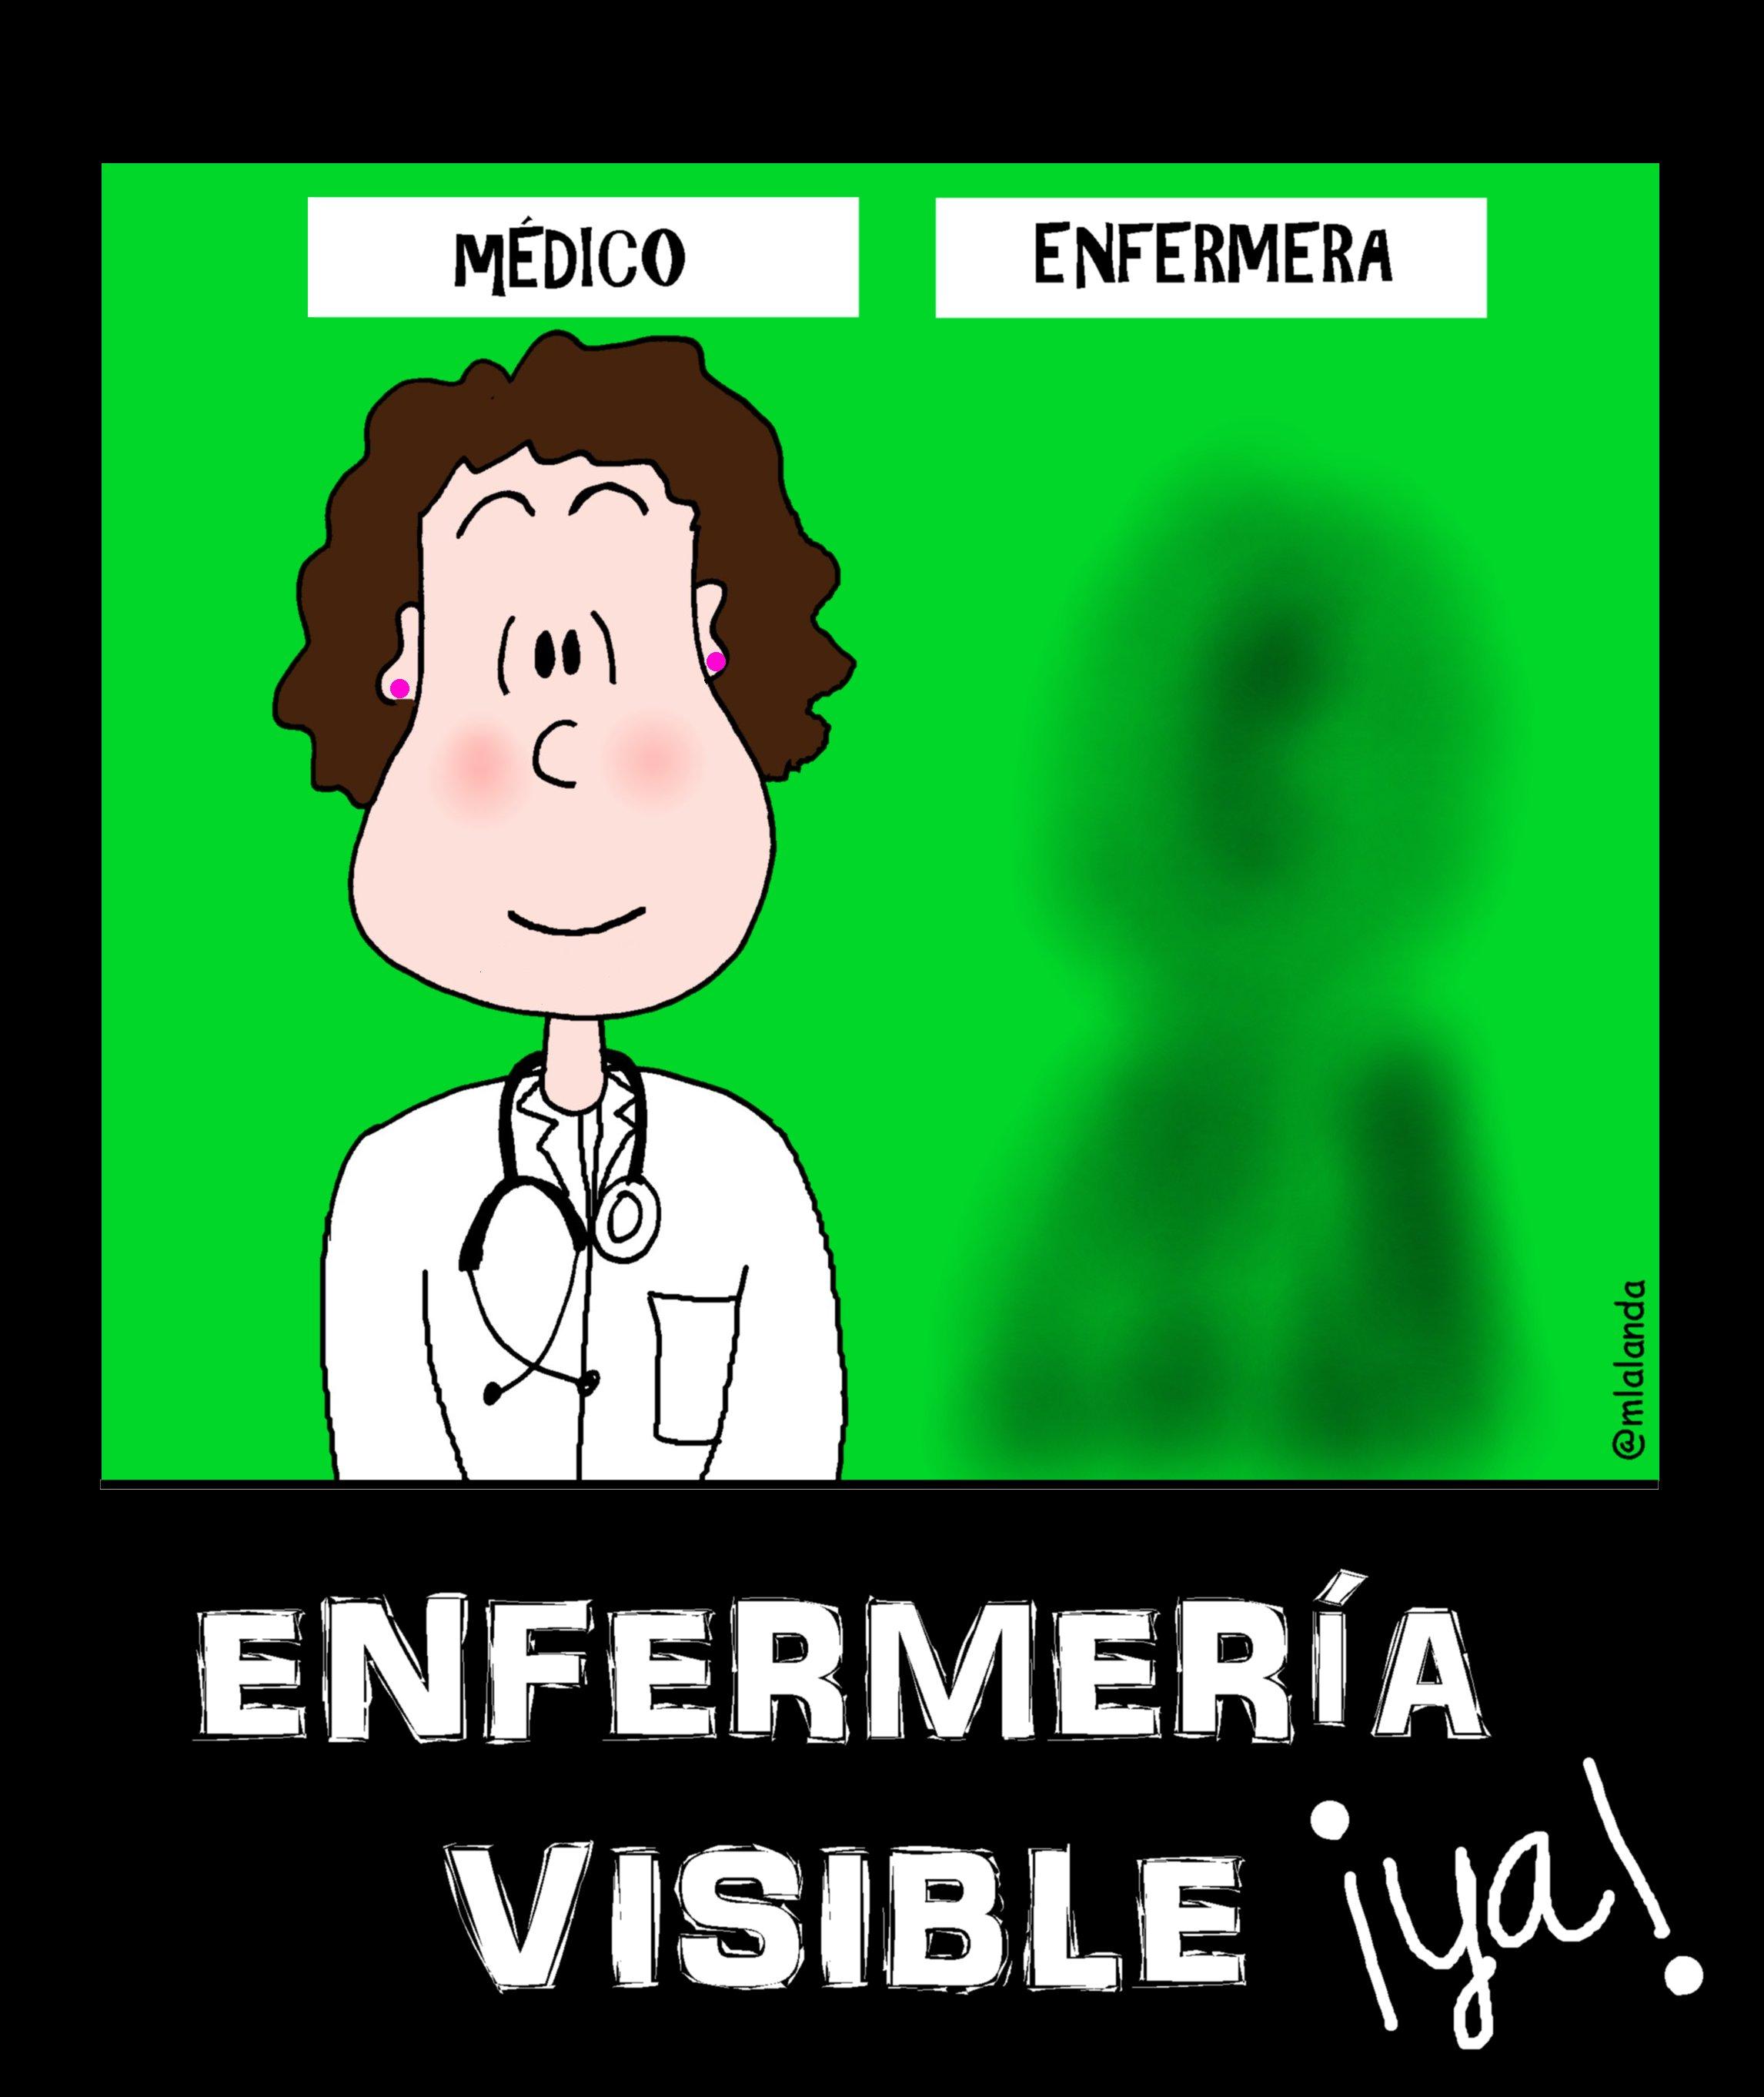 ENFERMERIA VISIBLE